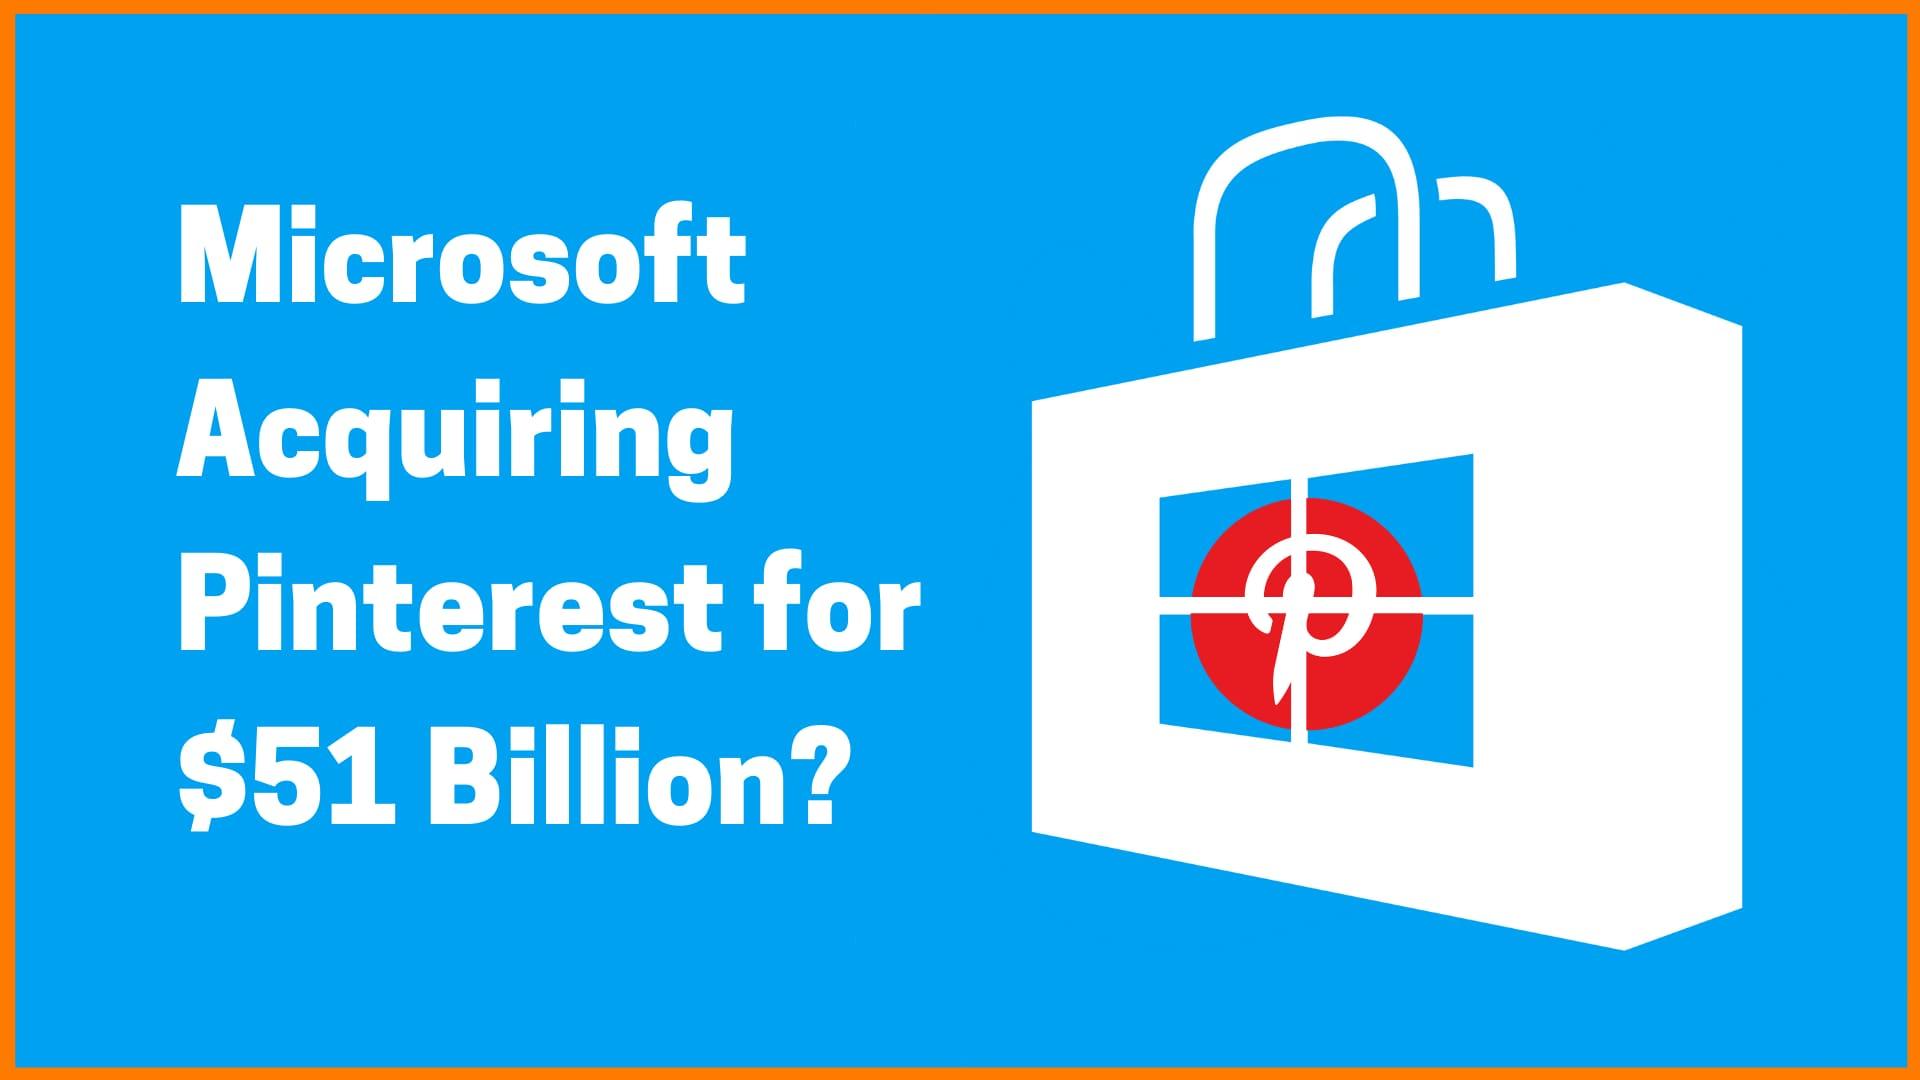 Is Microsoft Acquiring Pinterest?